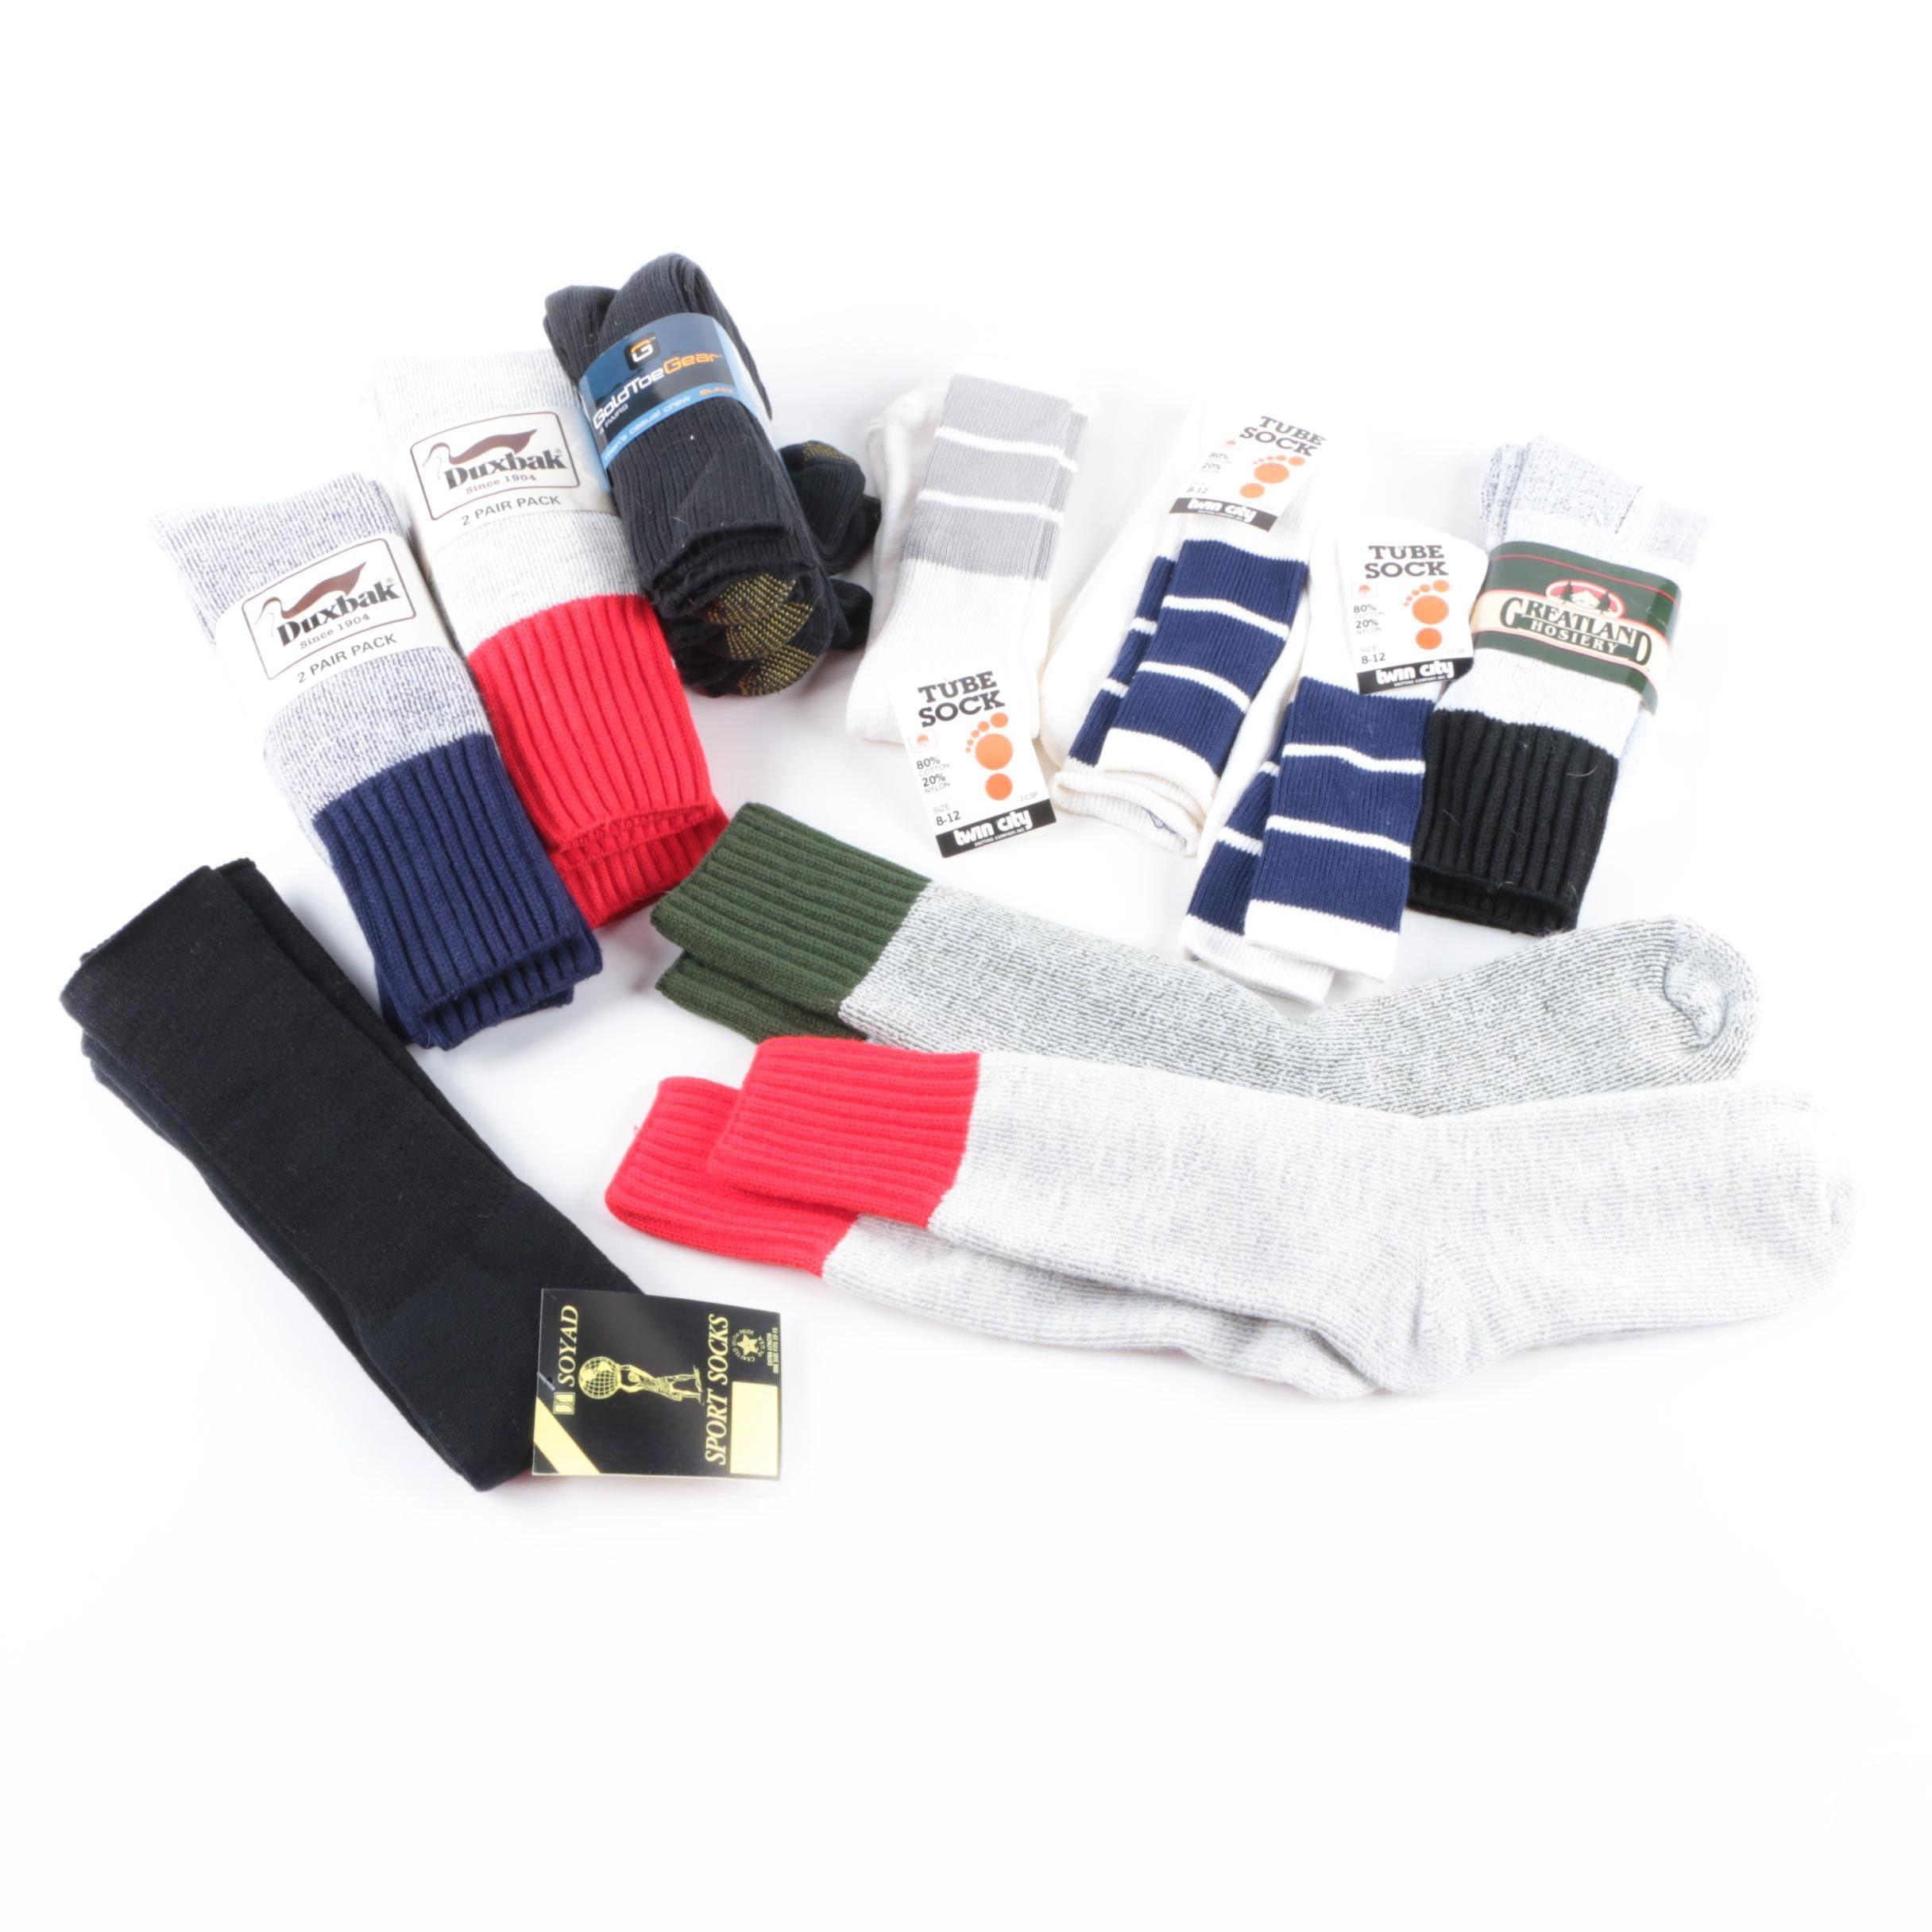 Sports Socks Including Gold Toe and Duxbak